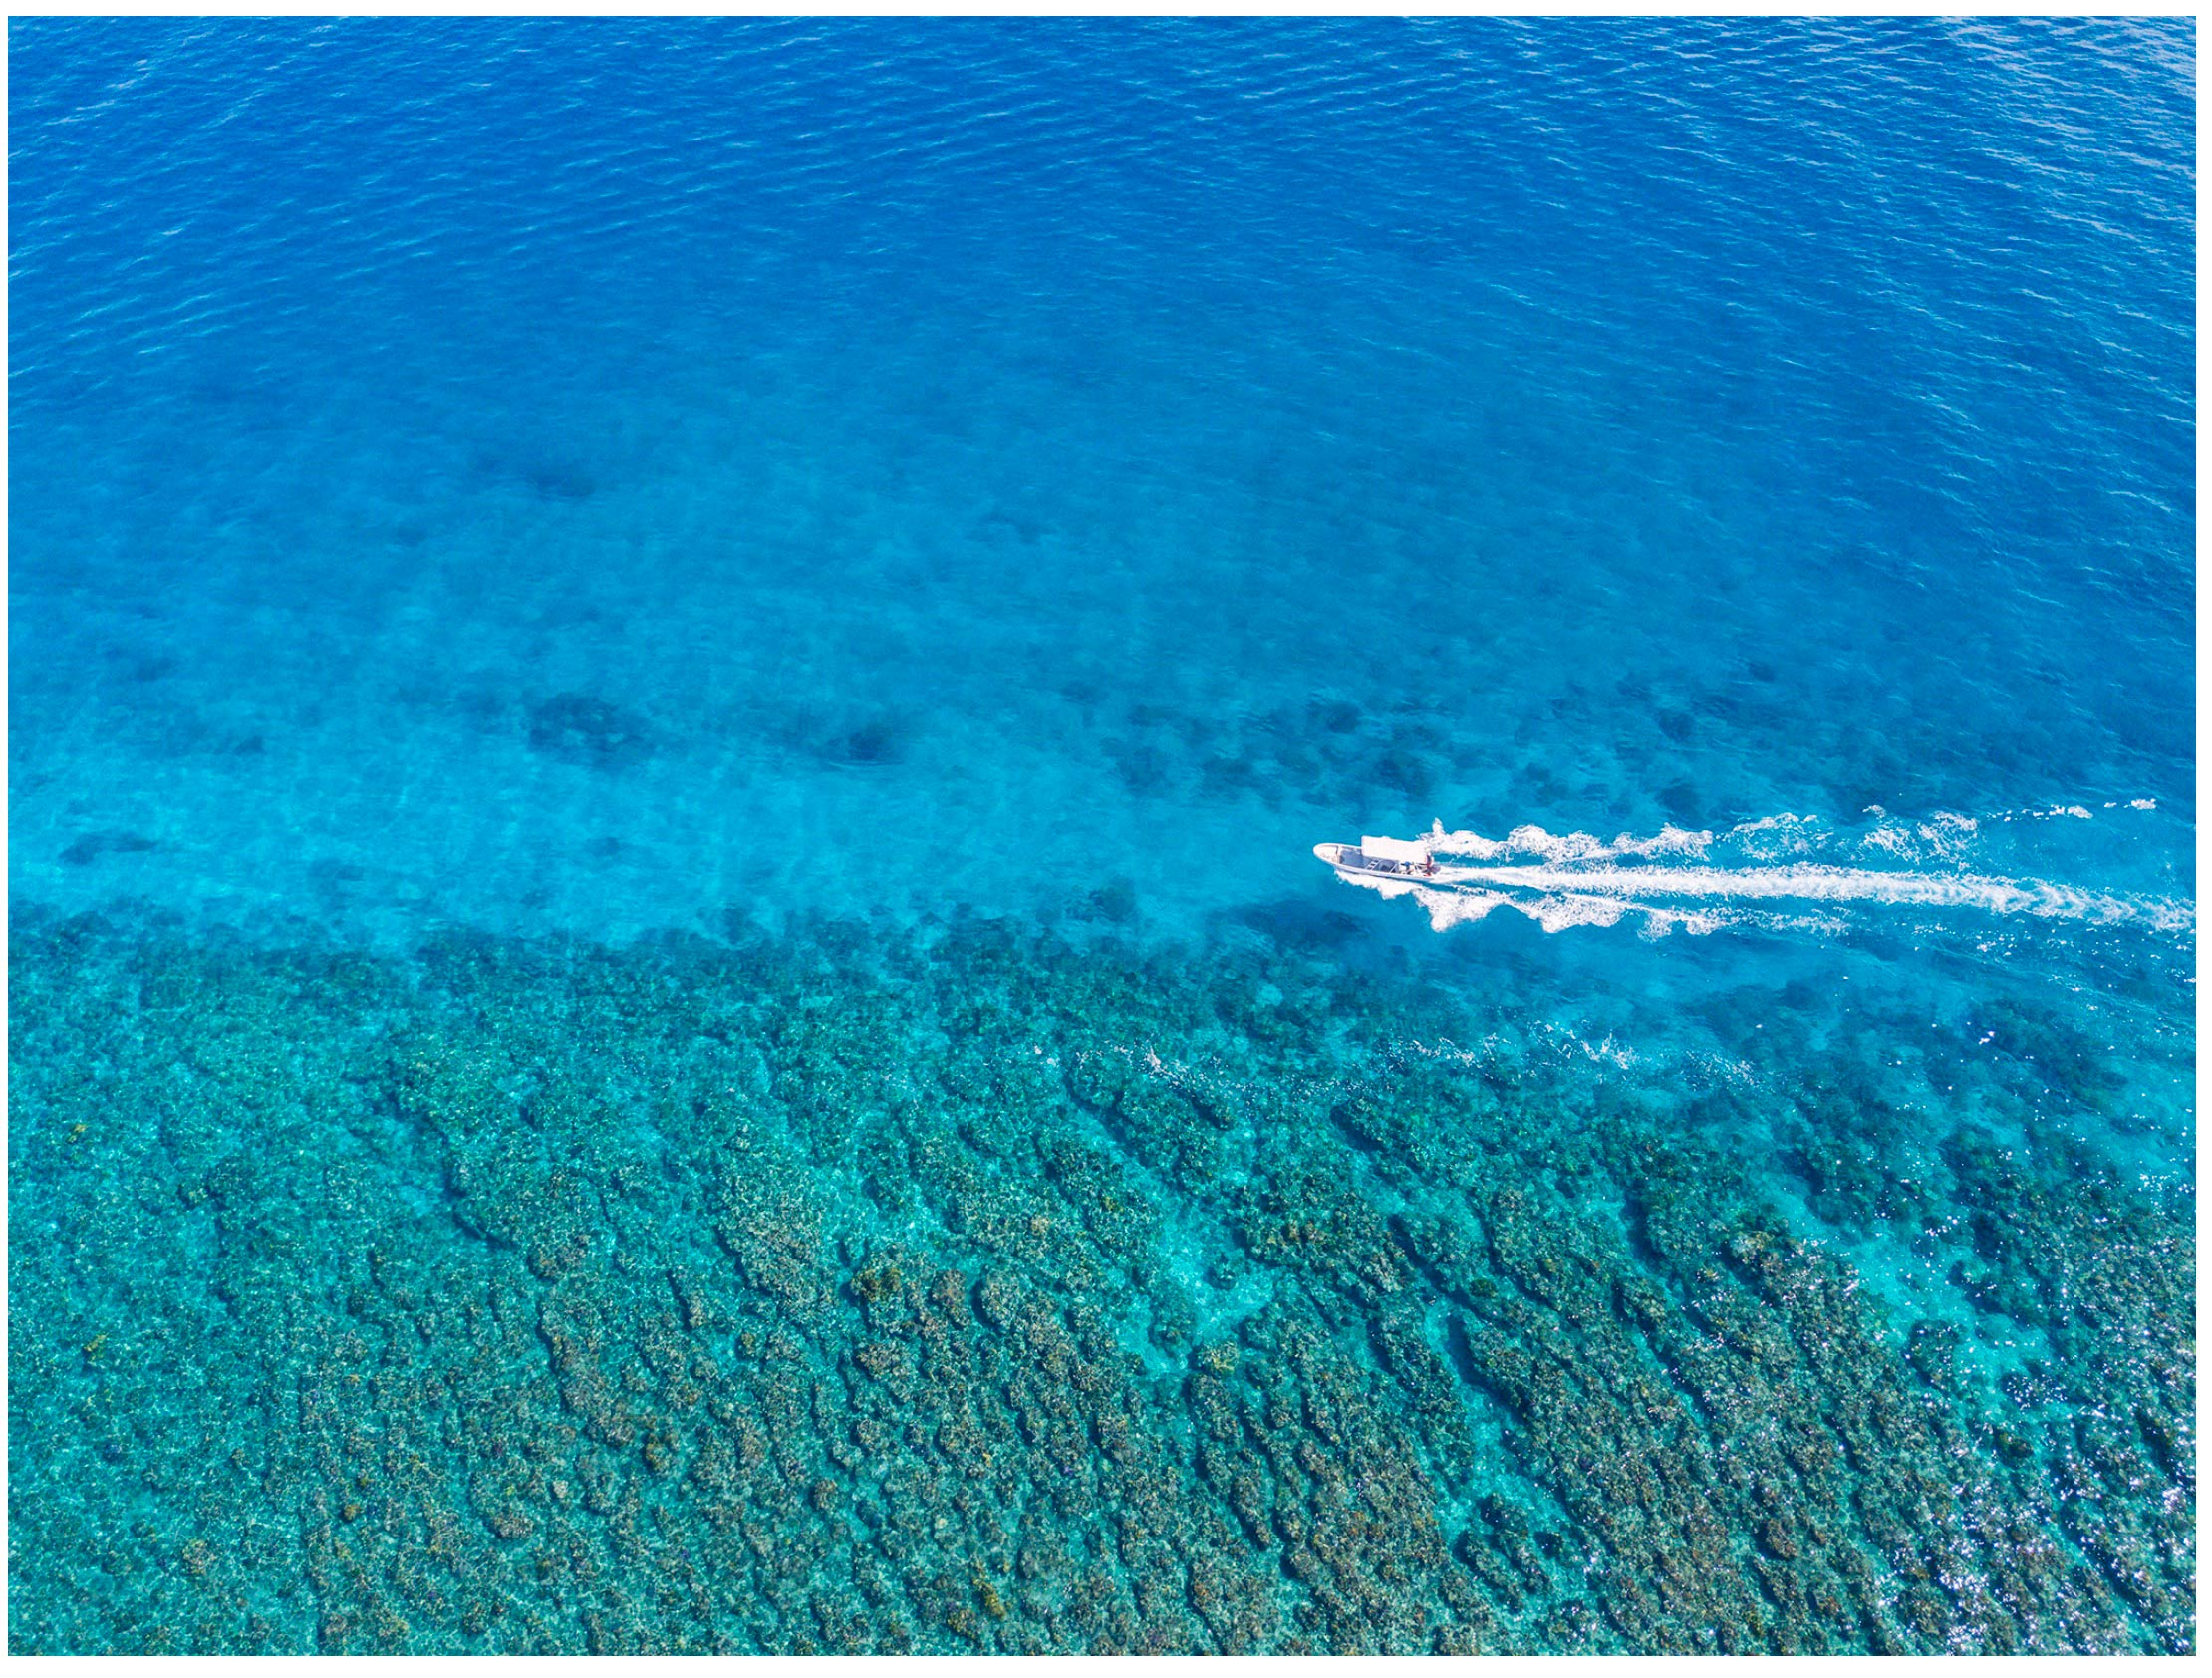 rodd-owen-ocean-surf-photography-for-sale-142.jpg